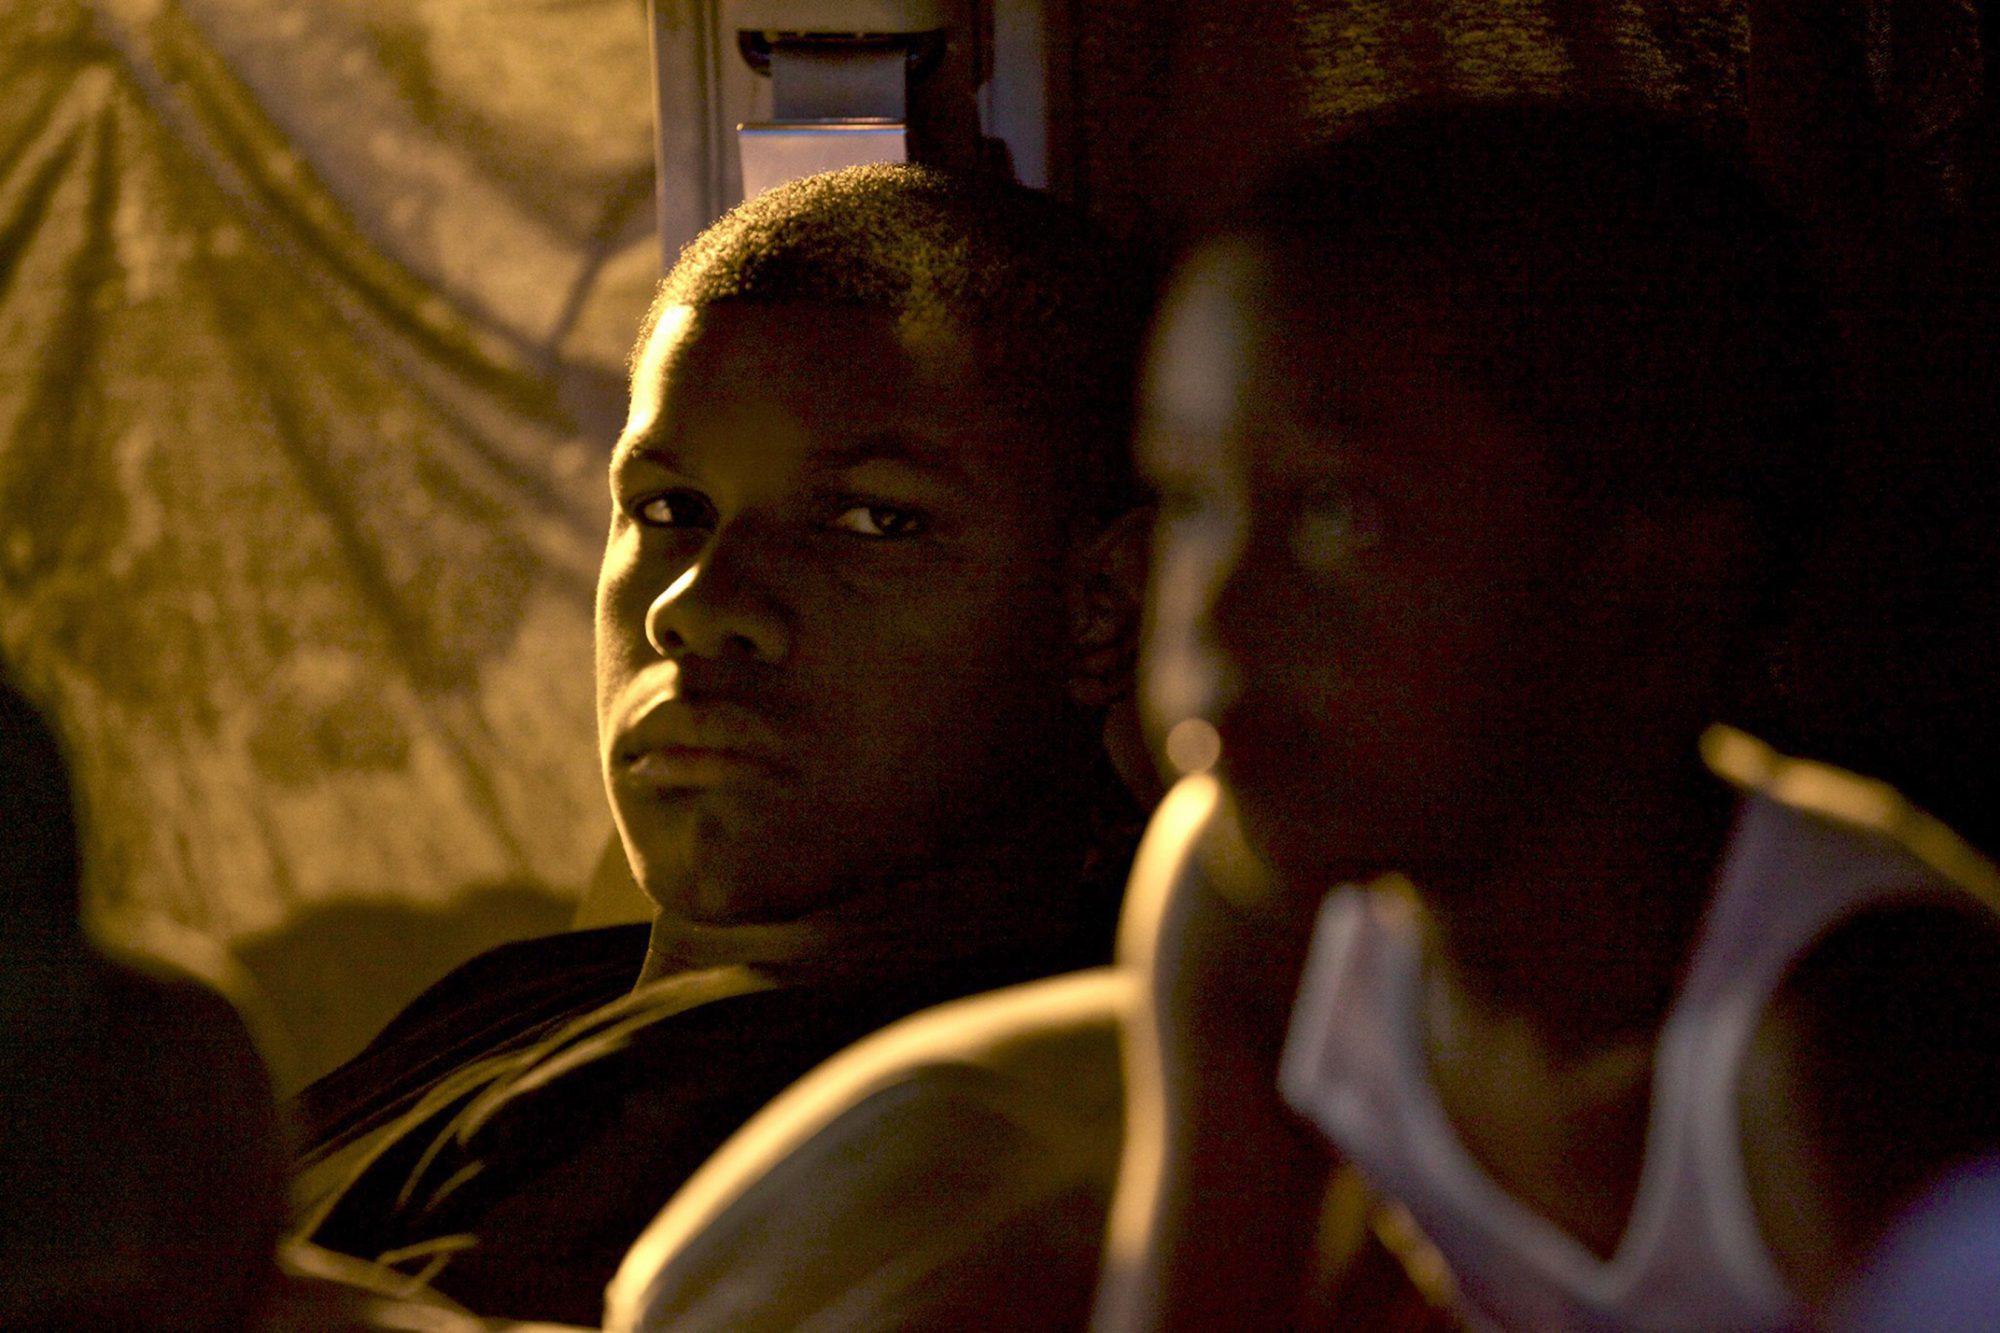 IMPERIAL DREAMS, left: John Boyega, 2014.